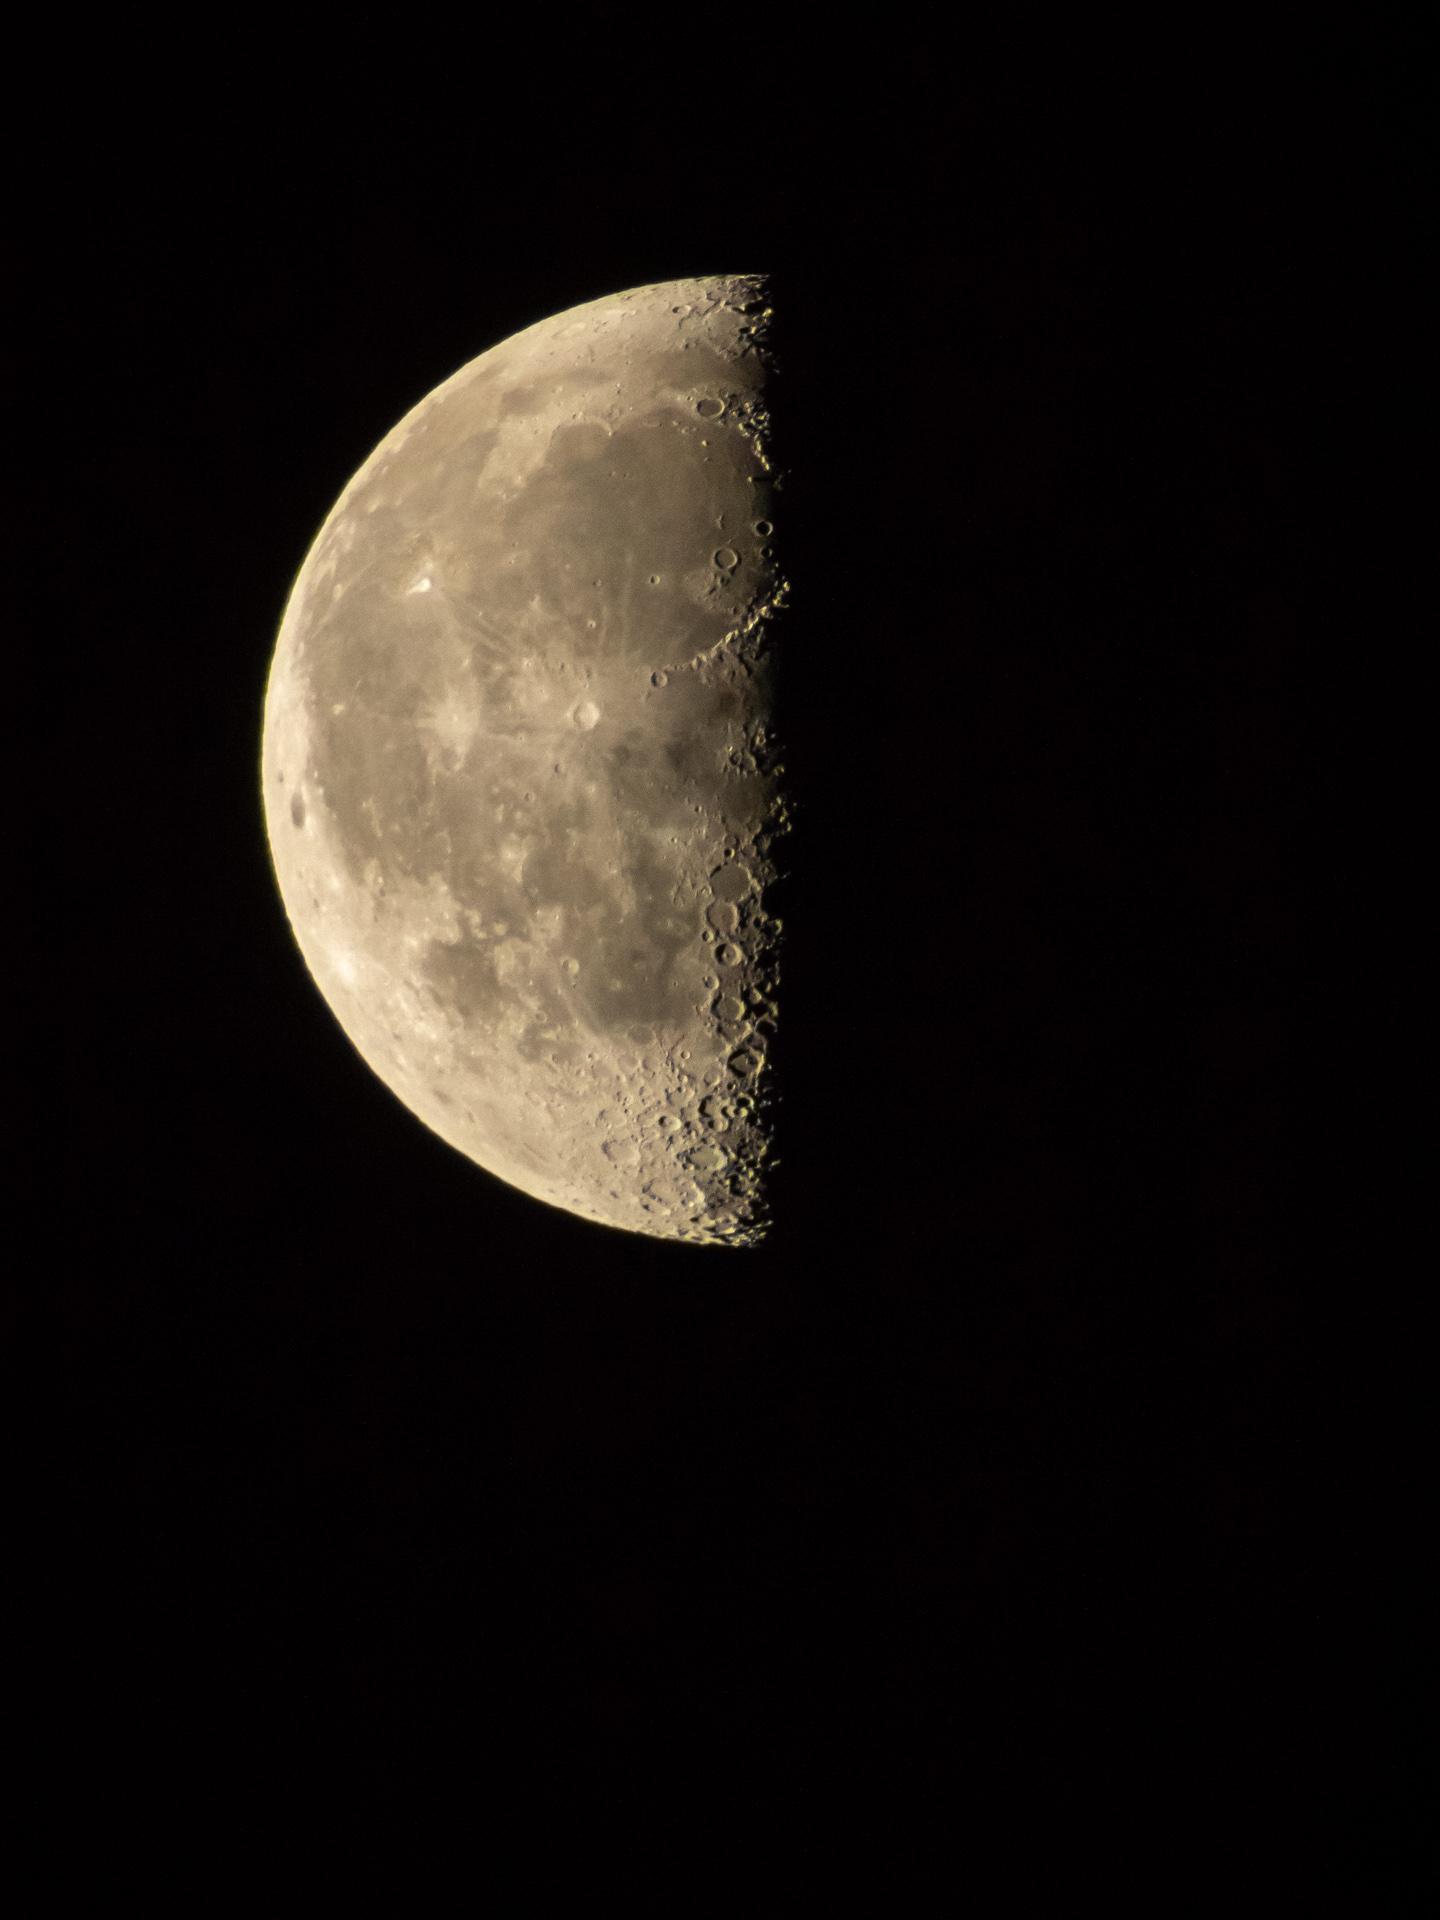 Last Quarter Moon | 20190526 0513 E:38.96x77.00@84m